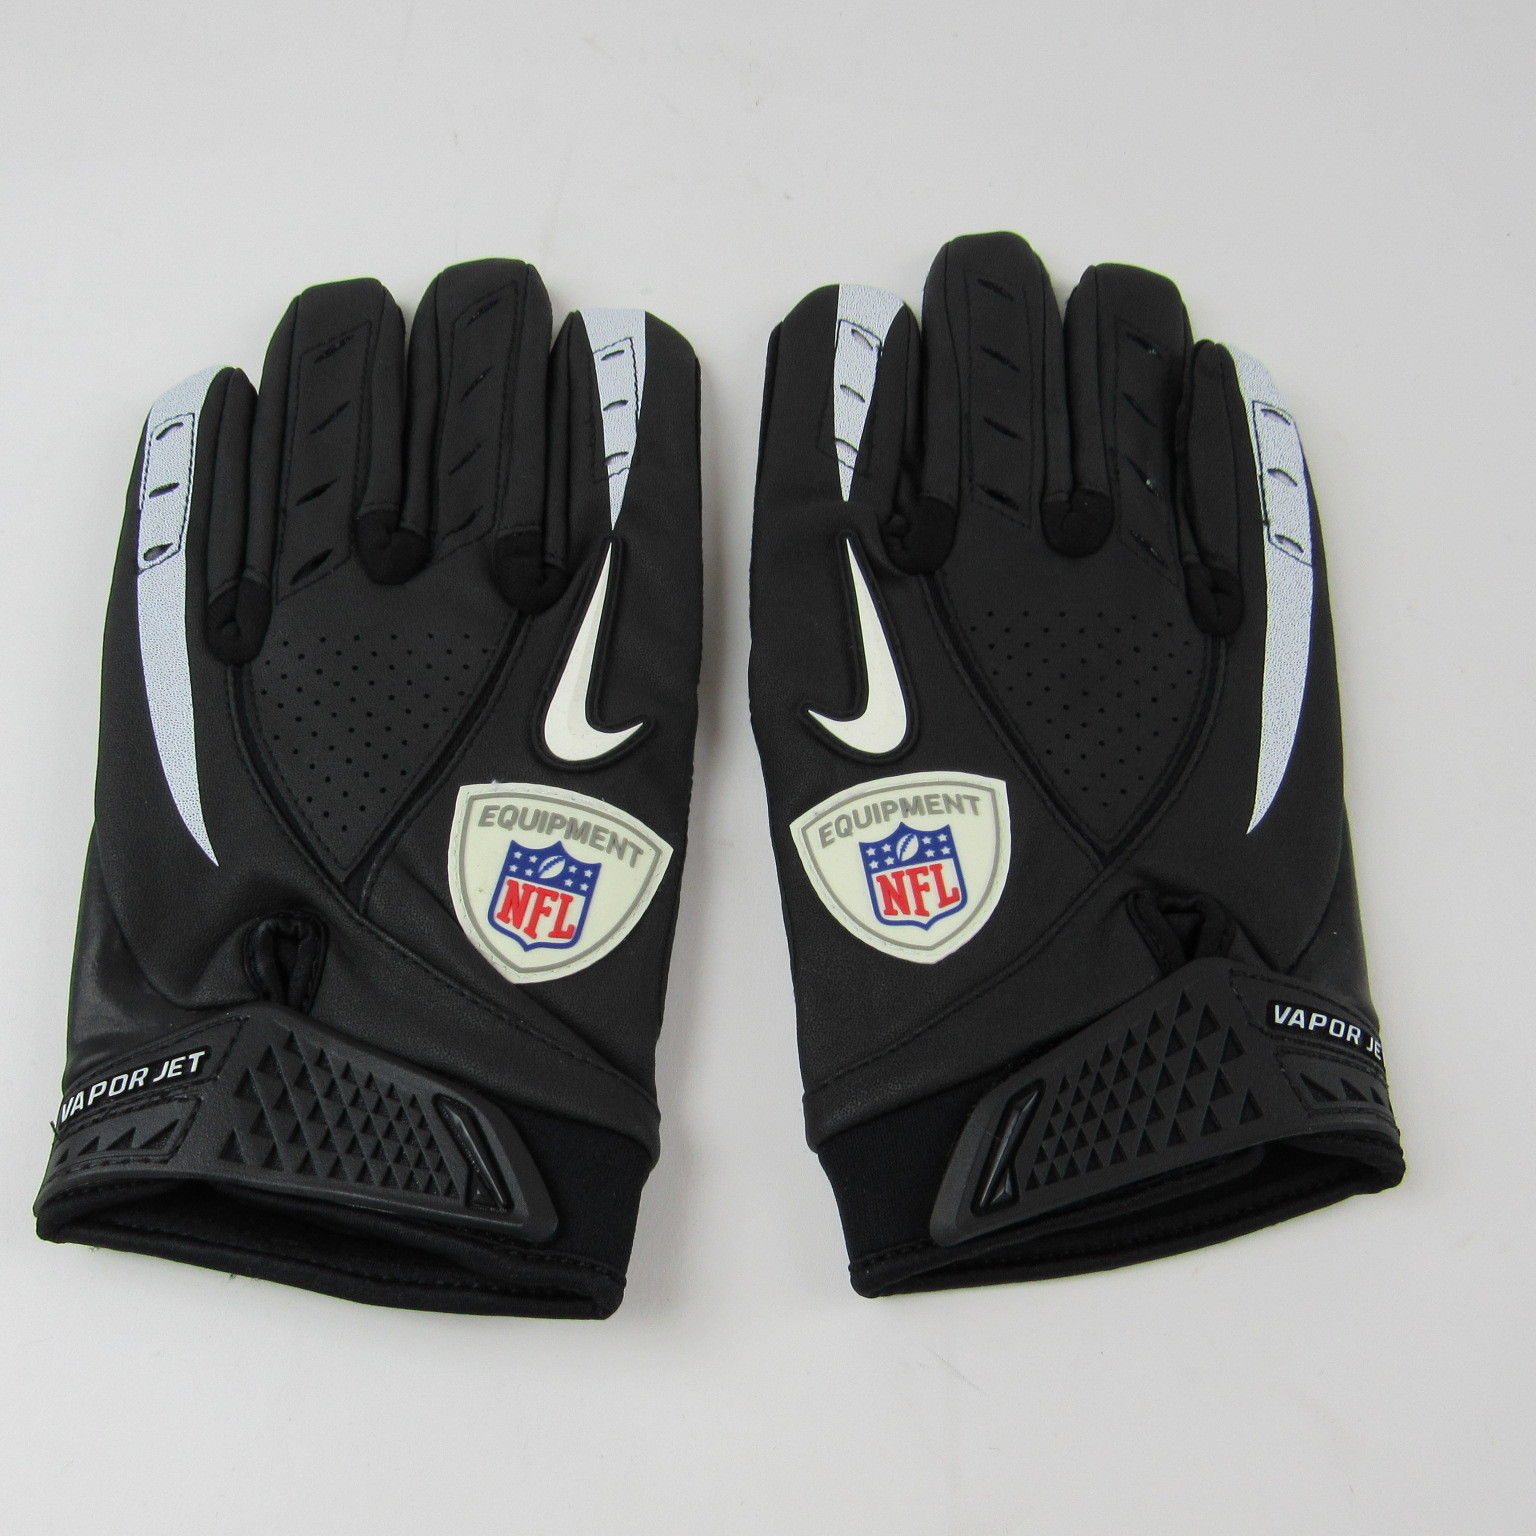 3a71369c86e Nike NFL NCAA Vapor Jet Synthetic Thermal Football Gloves Black Grey New